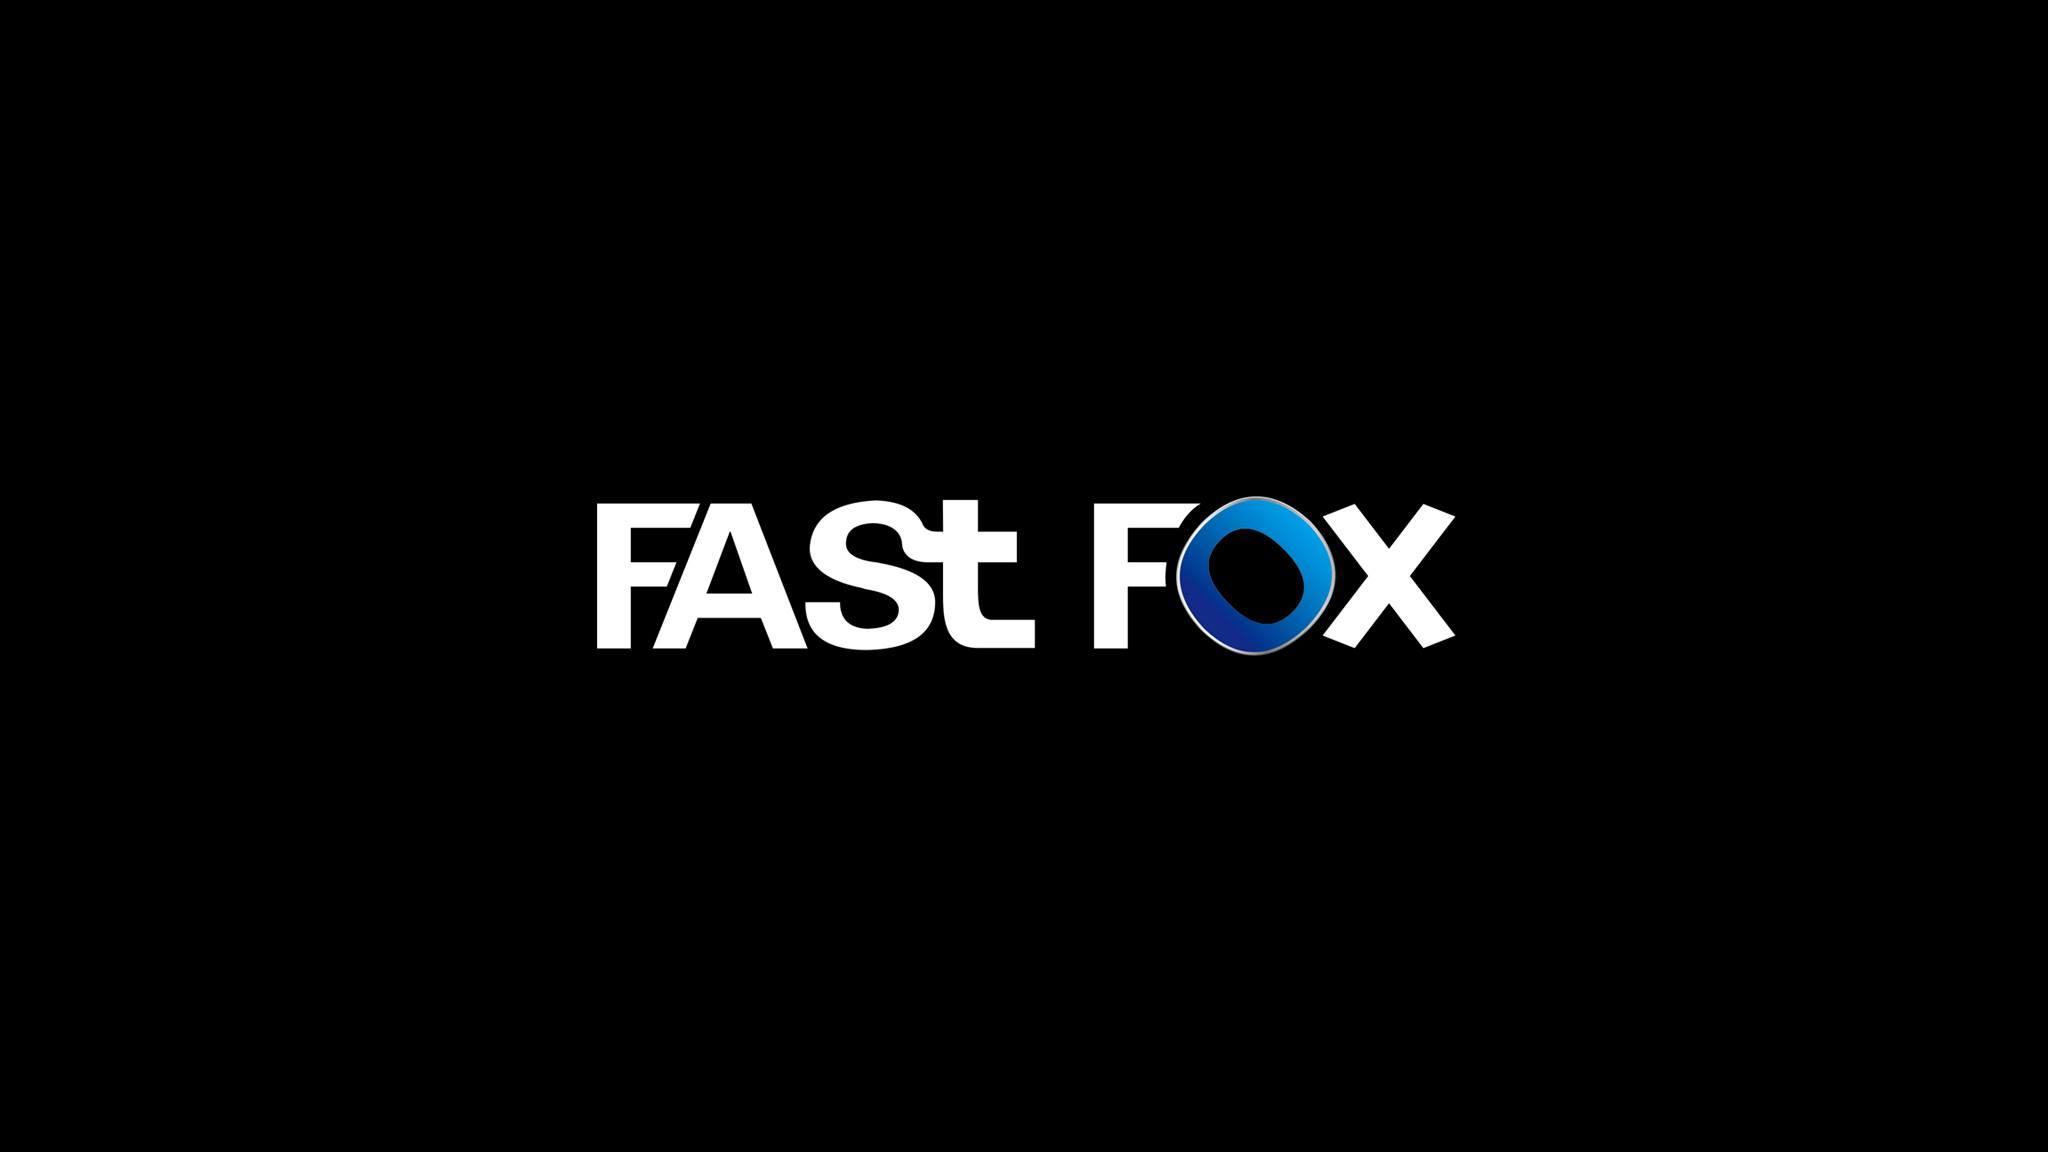 FastFox coupon codes